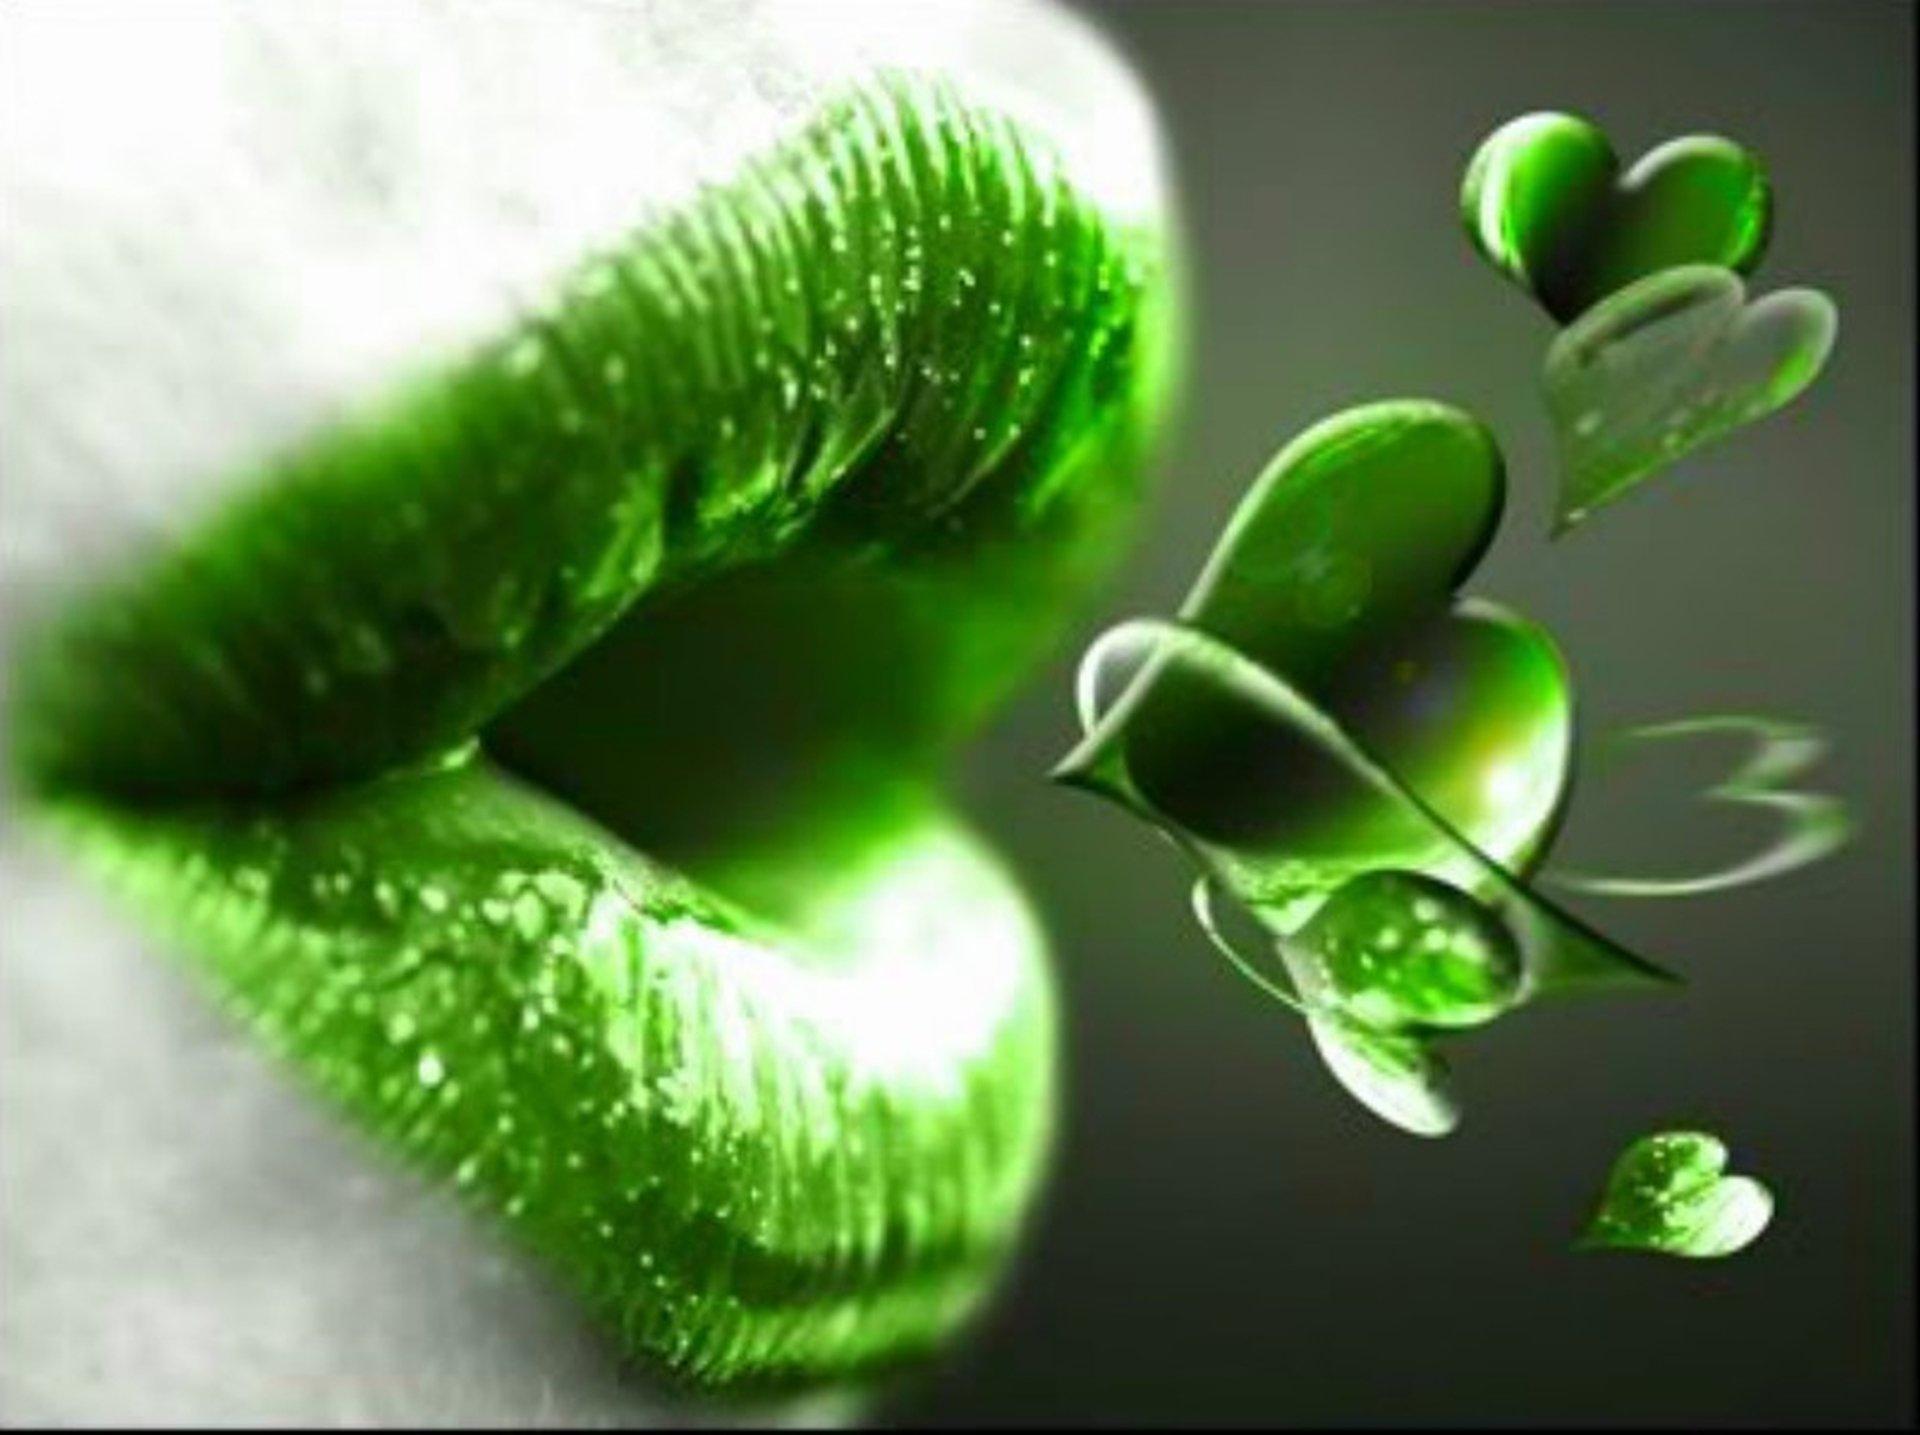 Abstract mouth lip 3d hearts green kiss wallpaper ...